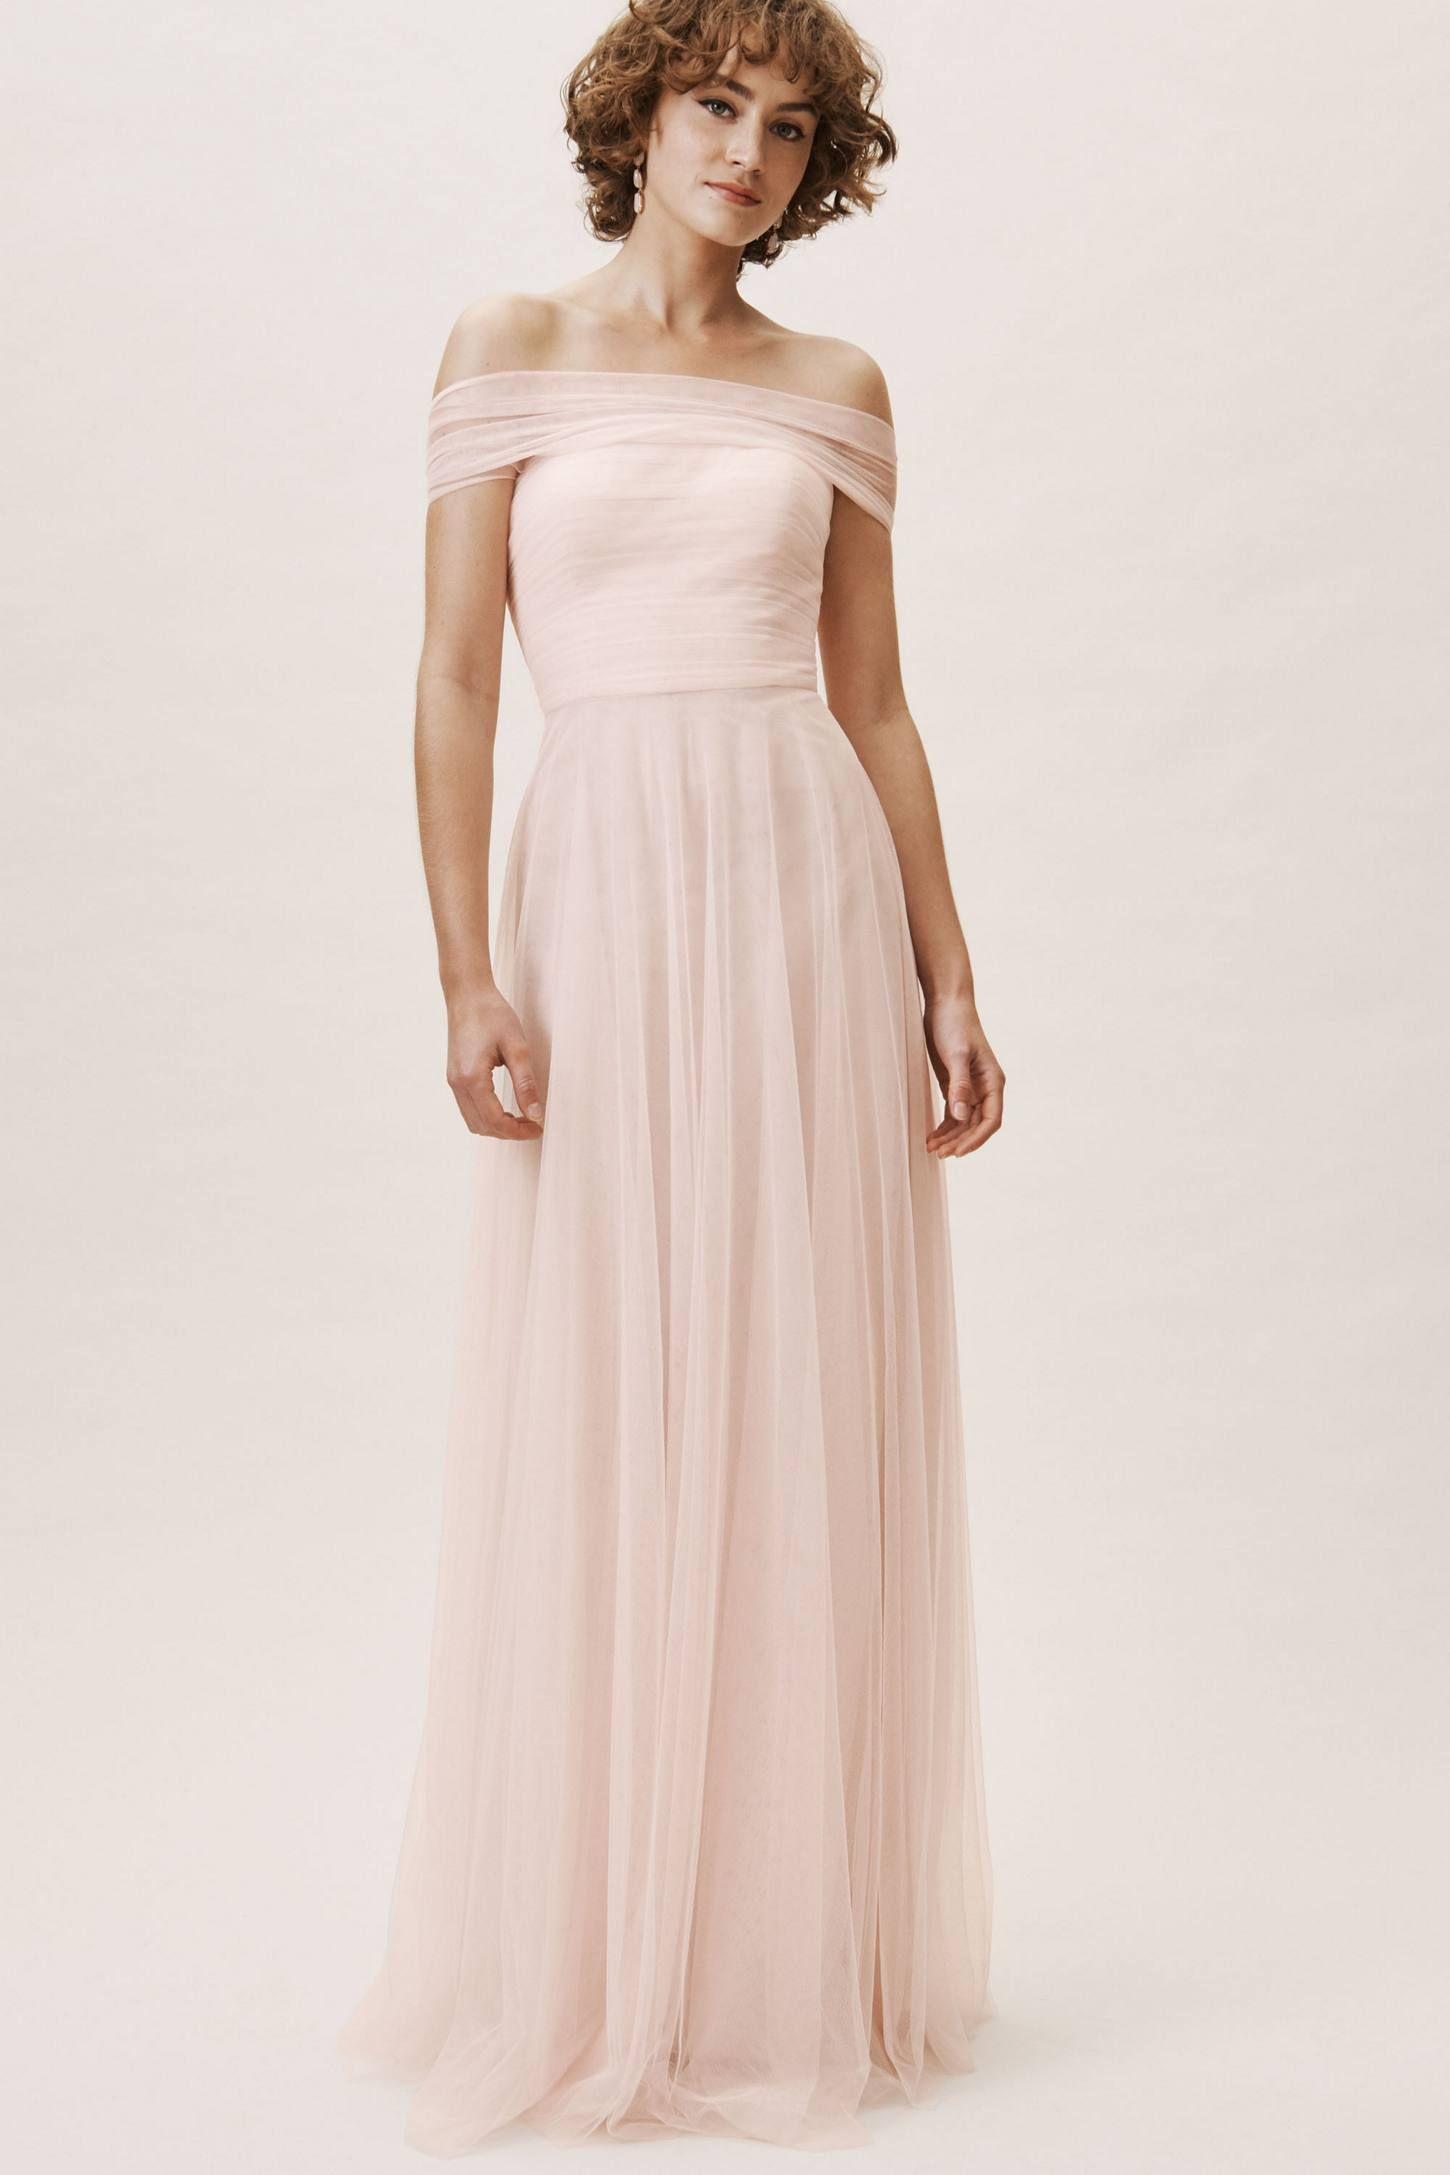 Bloomingdales Prom Dresses